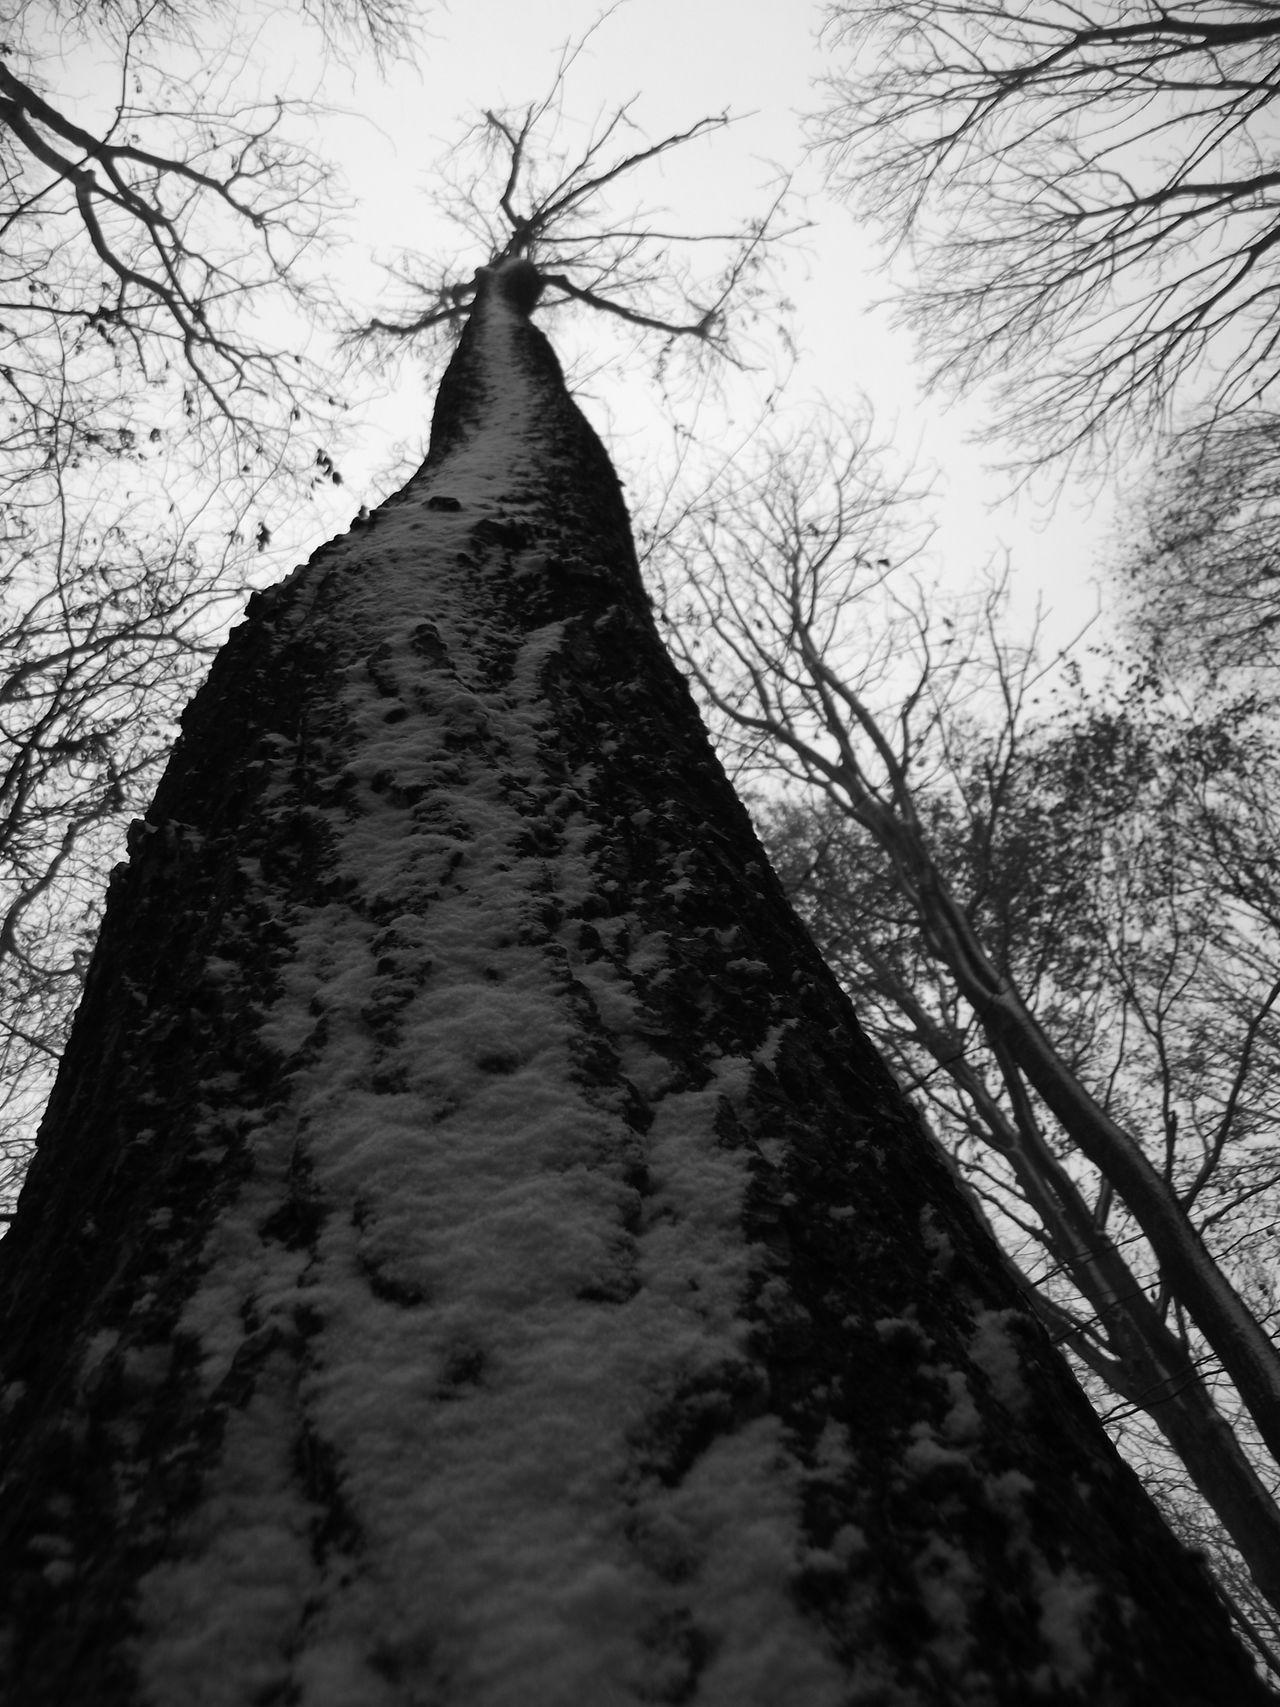 Bare Tree Beauty In Nature Black And White Branch Bükk Bükk National Park Hungary Low Angle View Nature No People Sky Tree Tree Trunk